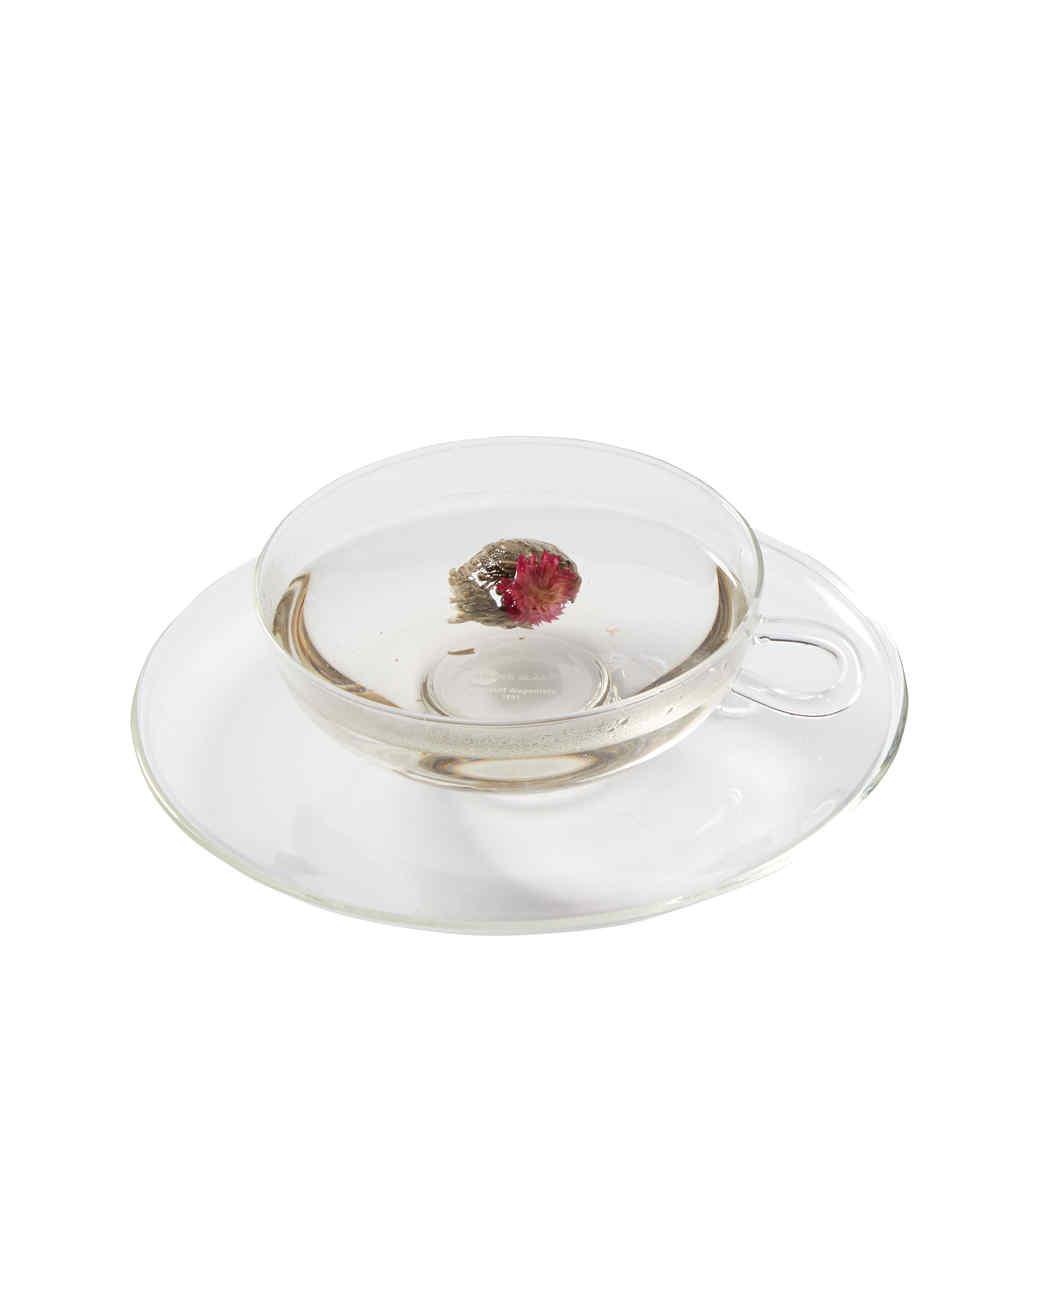 clear-teacup-1312-d112912_l.jpg